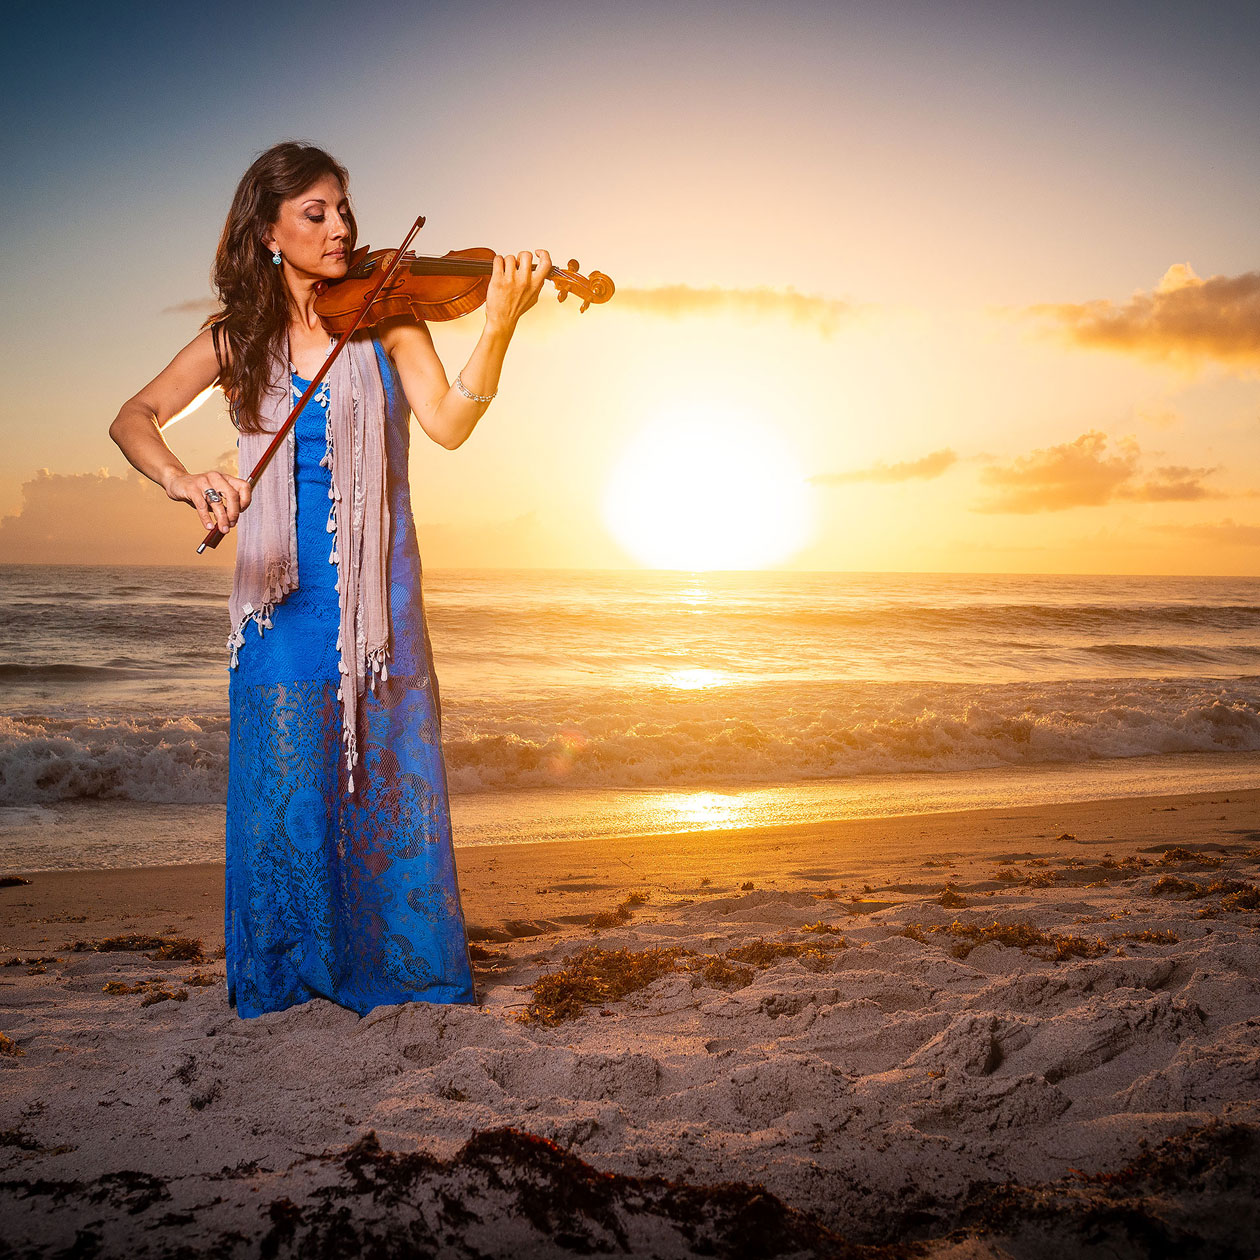 Mariana Sunset Violinist #6